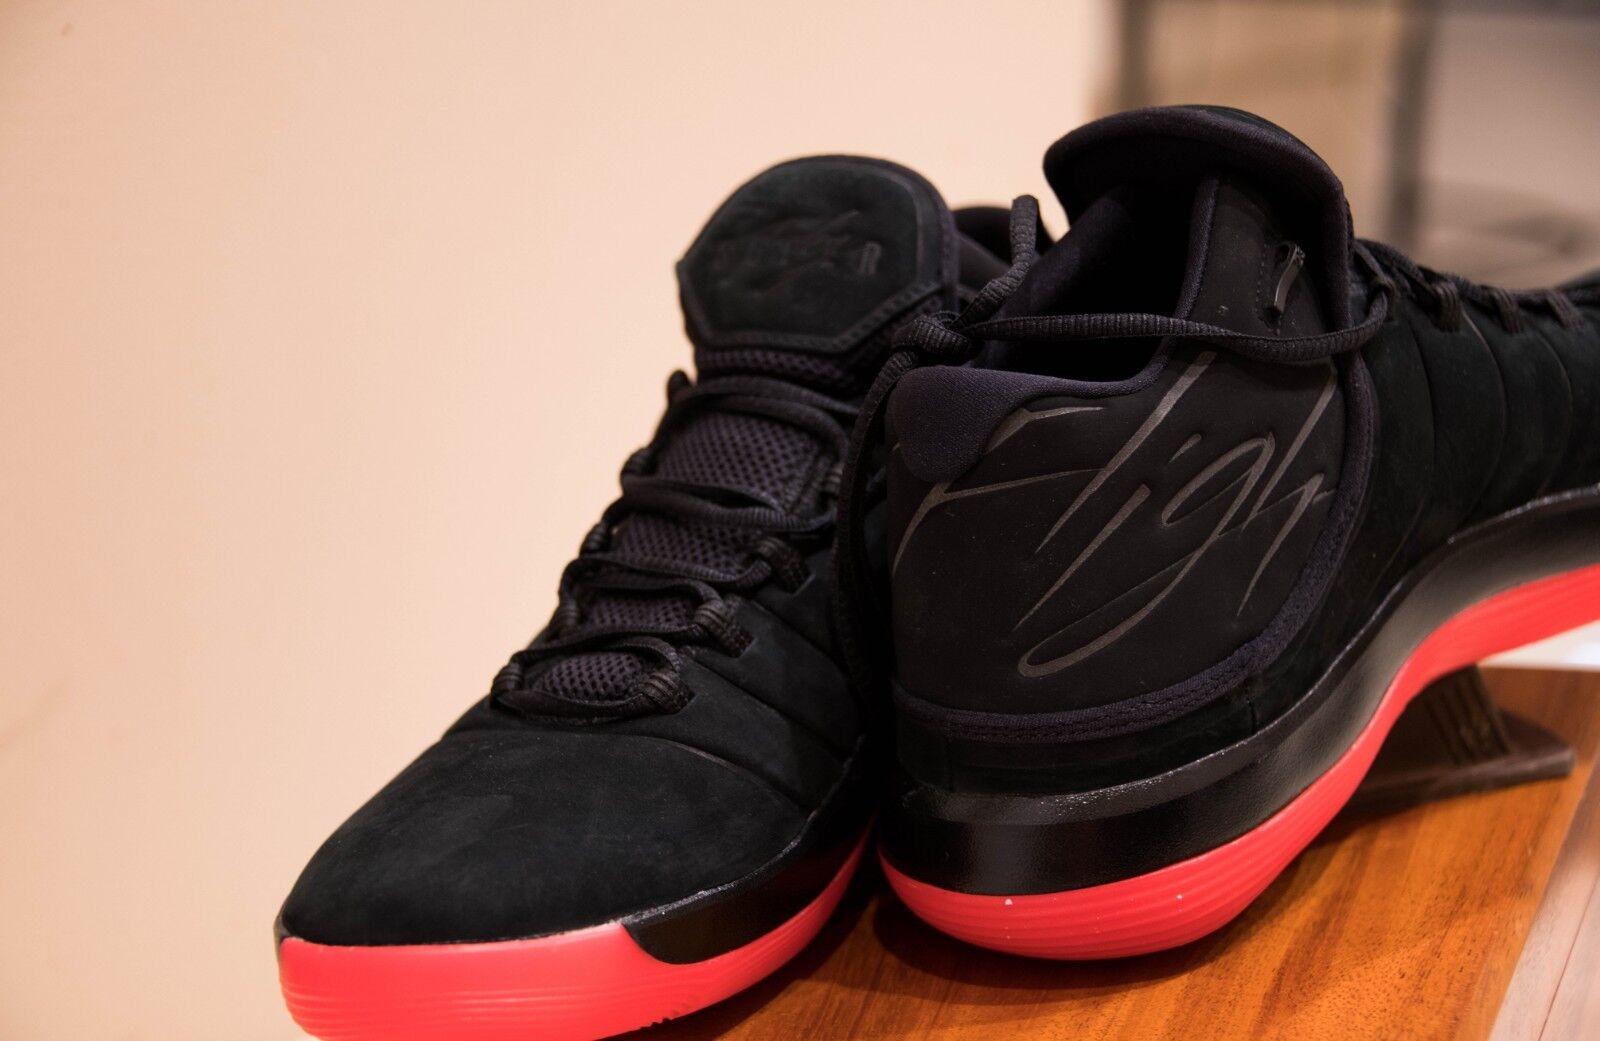 New Nike Jordan Super Fly 2017 Basketball Sneakers shoes 921203 024 Men's Sz 13